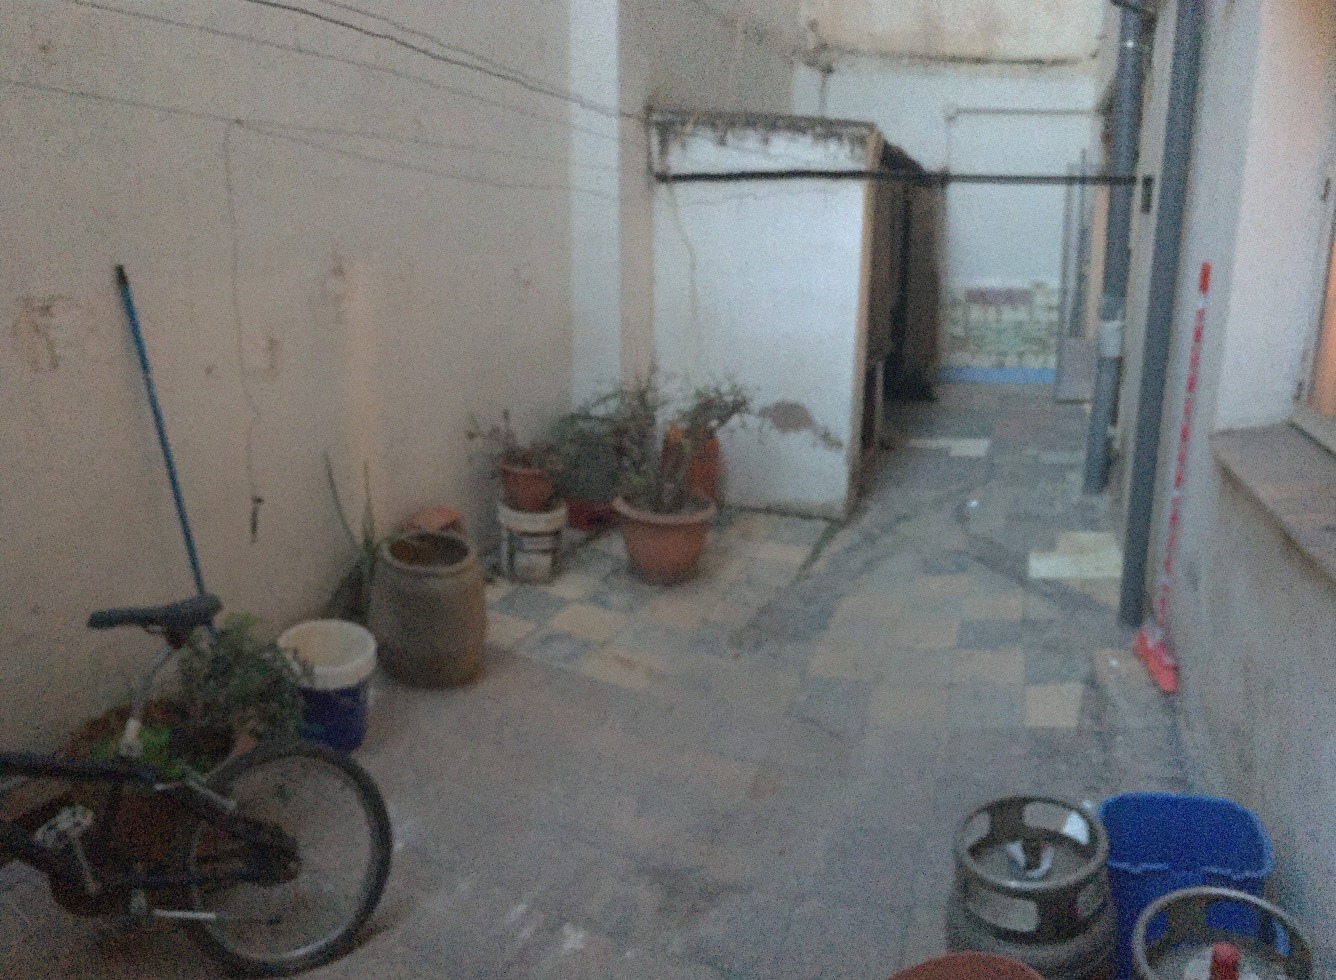 Planta baja en venta en Orriols